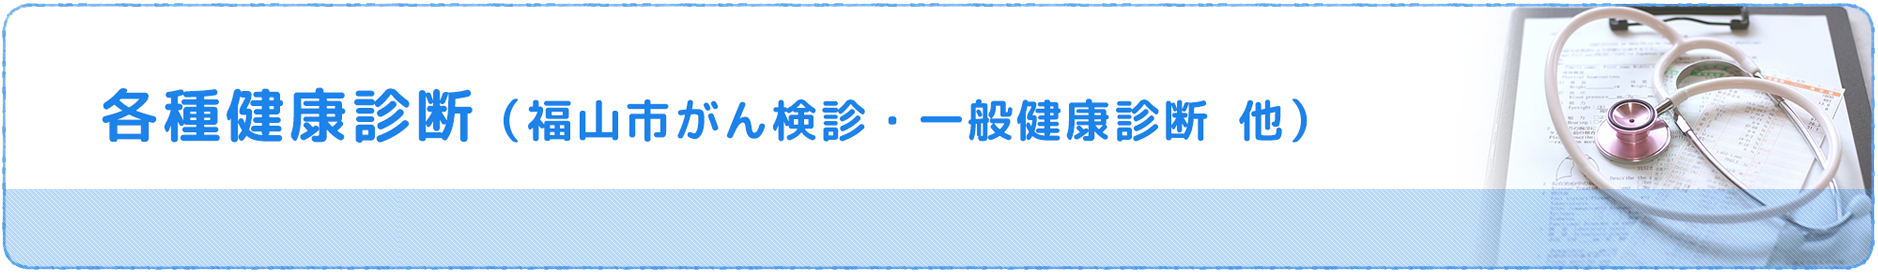 各種健康診断(福山市がん検診・一般健康診断 他)